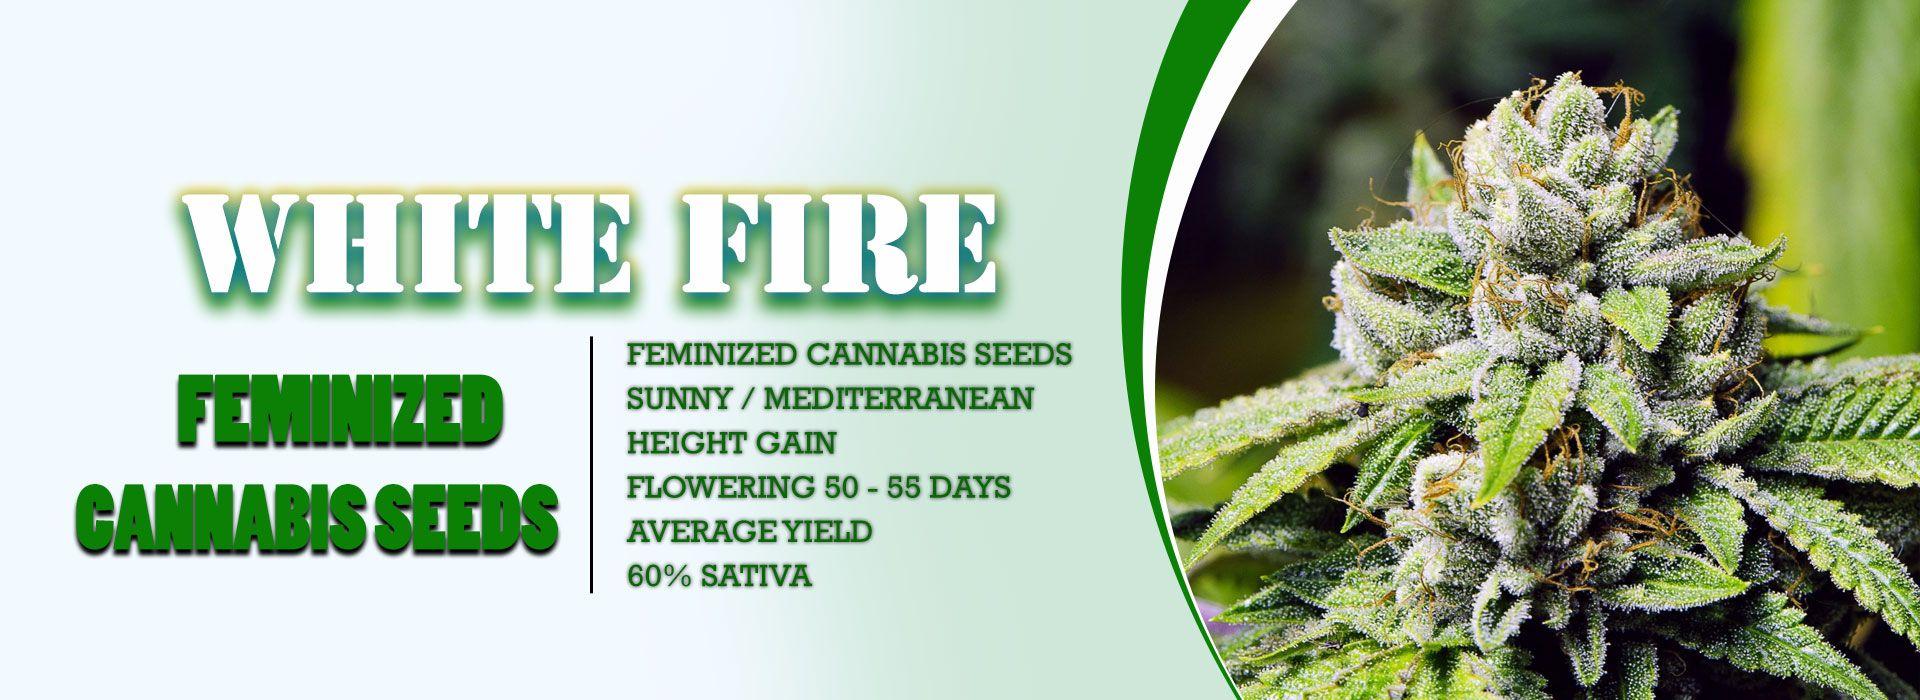 White Fire Feminized Seeds